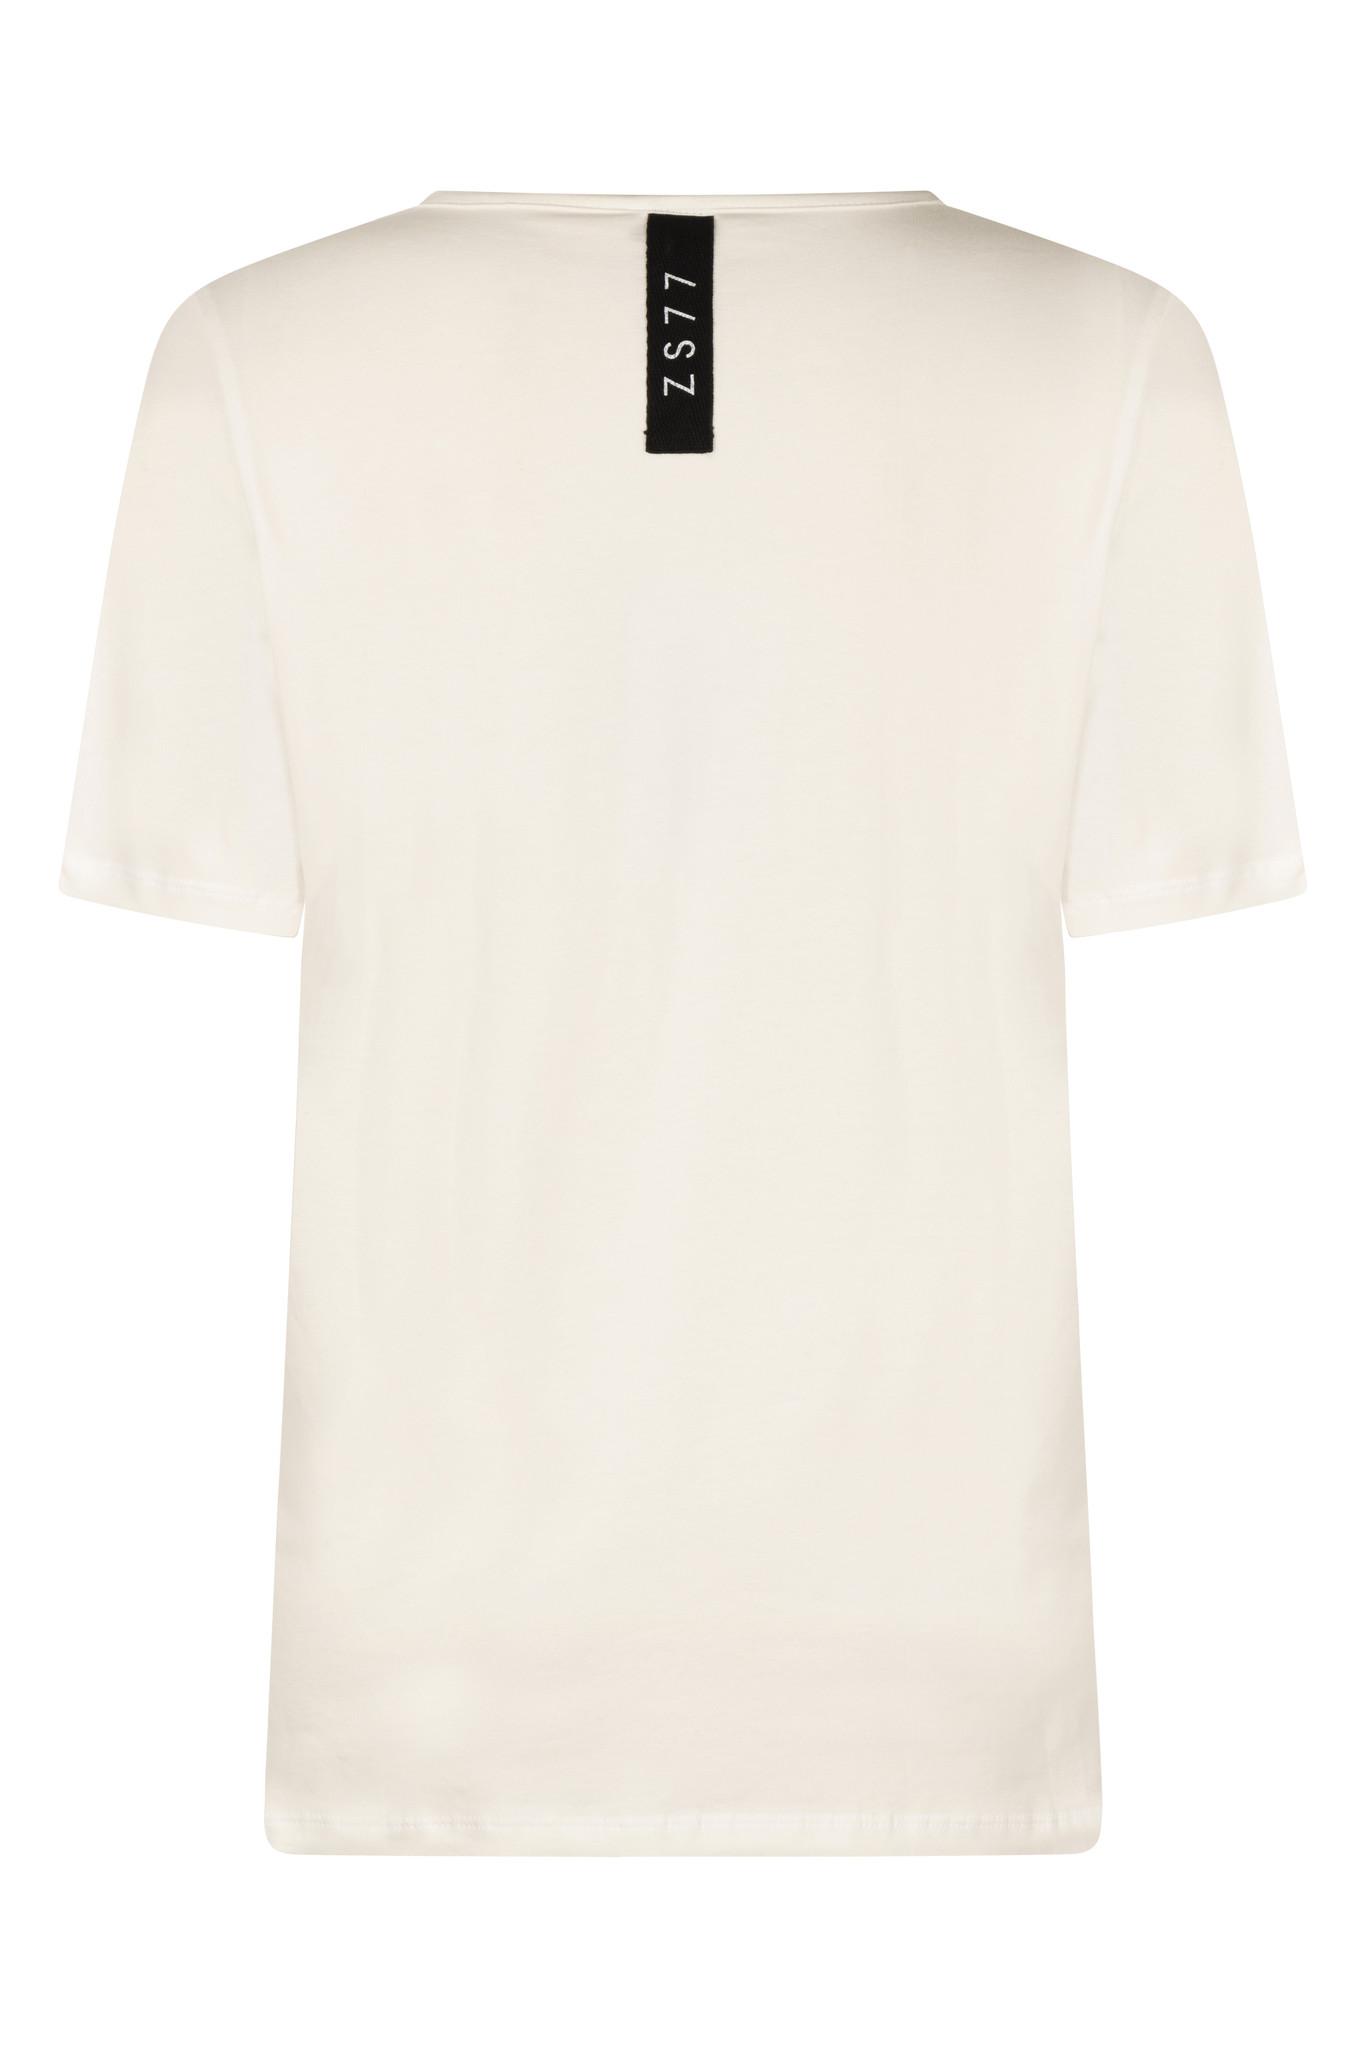 Zoso Zoso Lenny T-shirt  off white